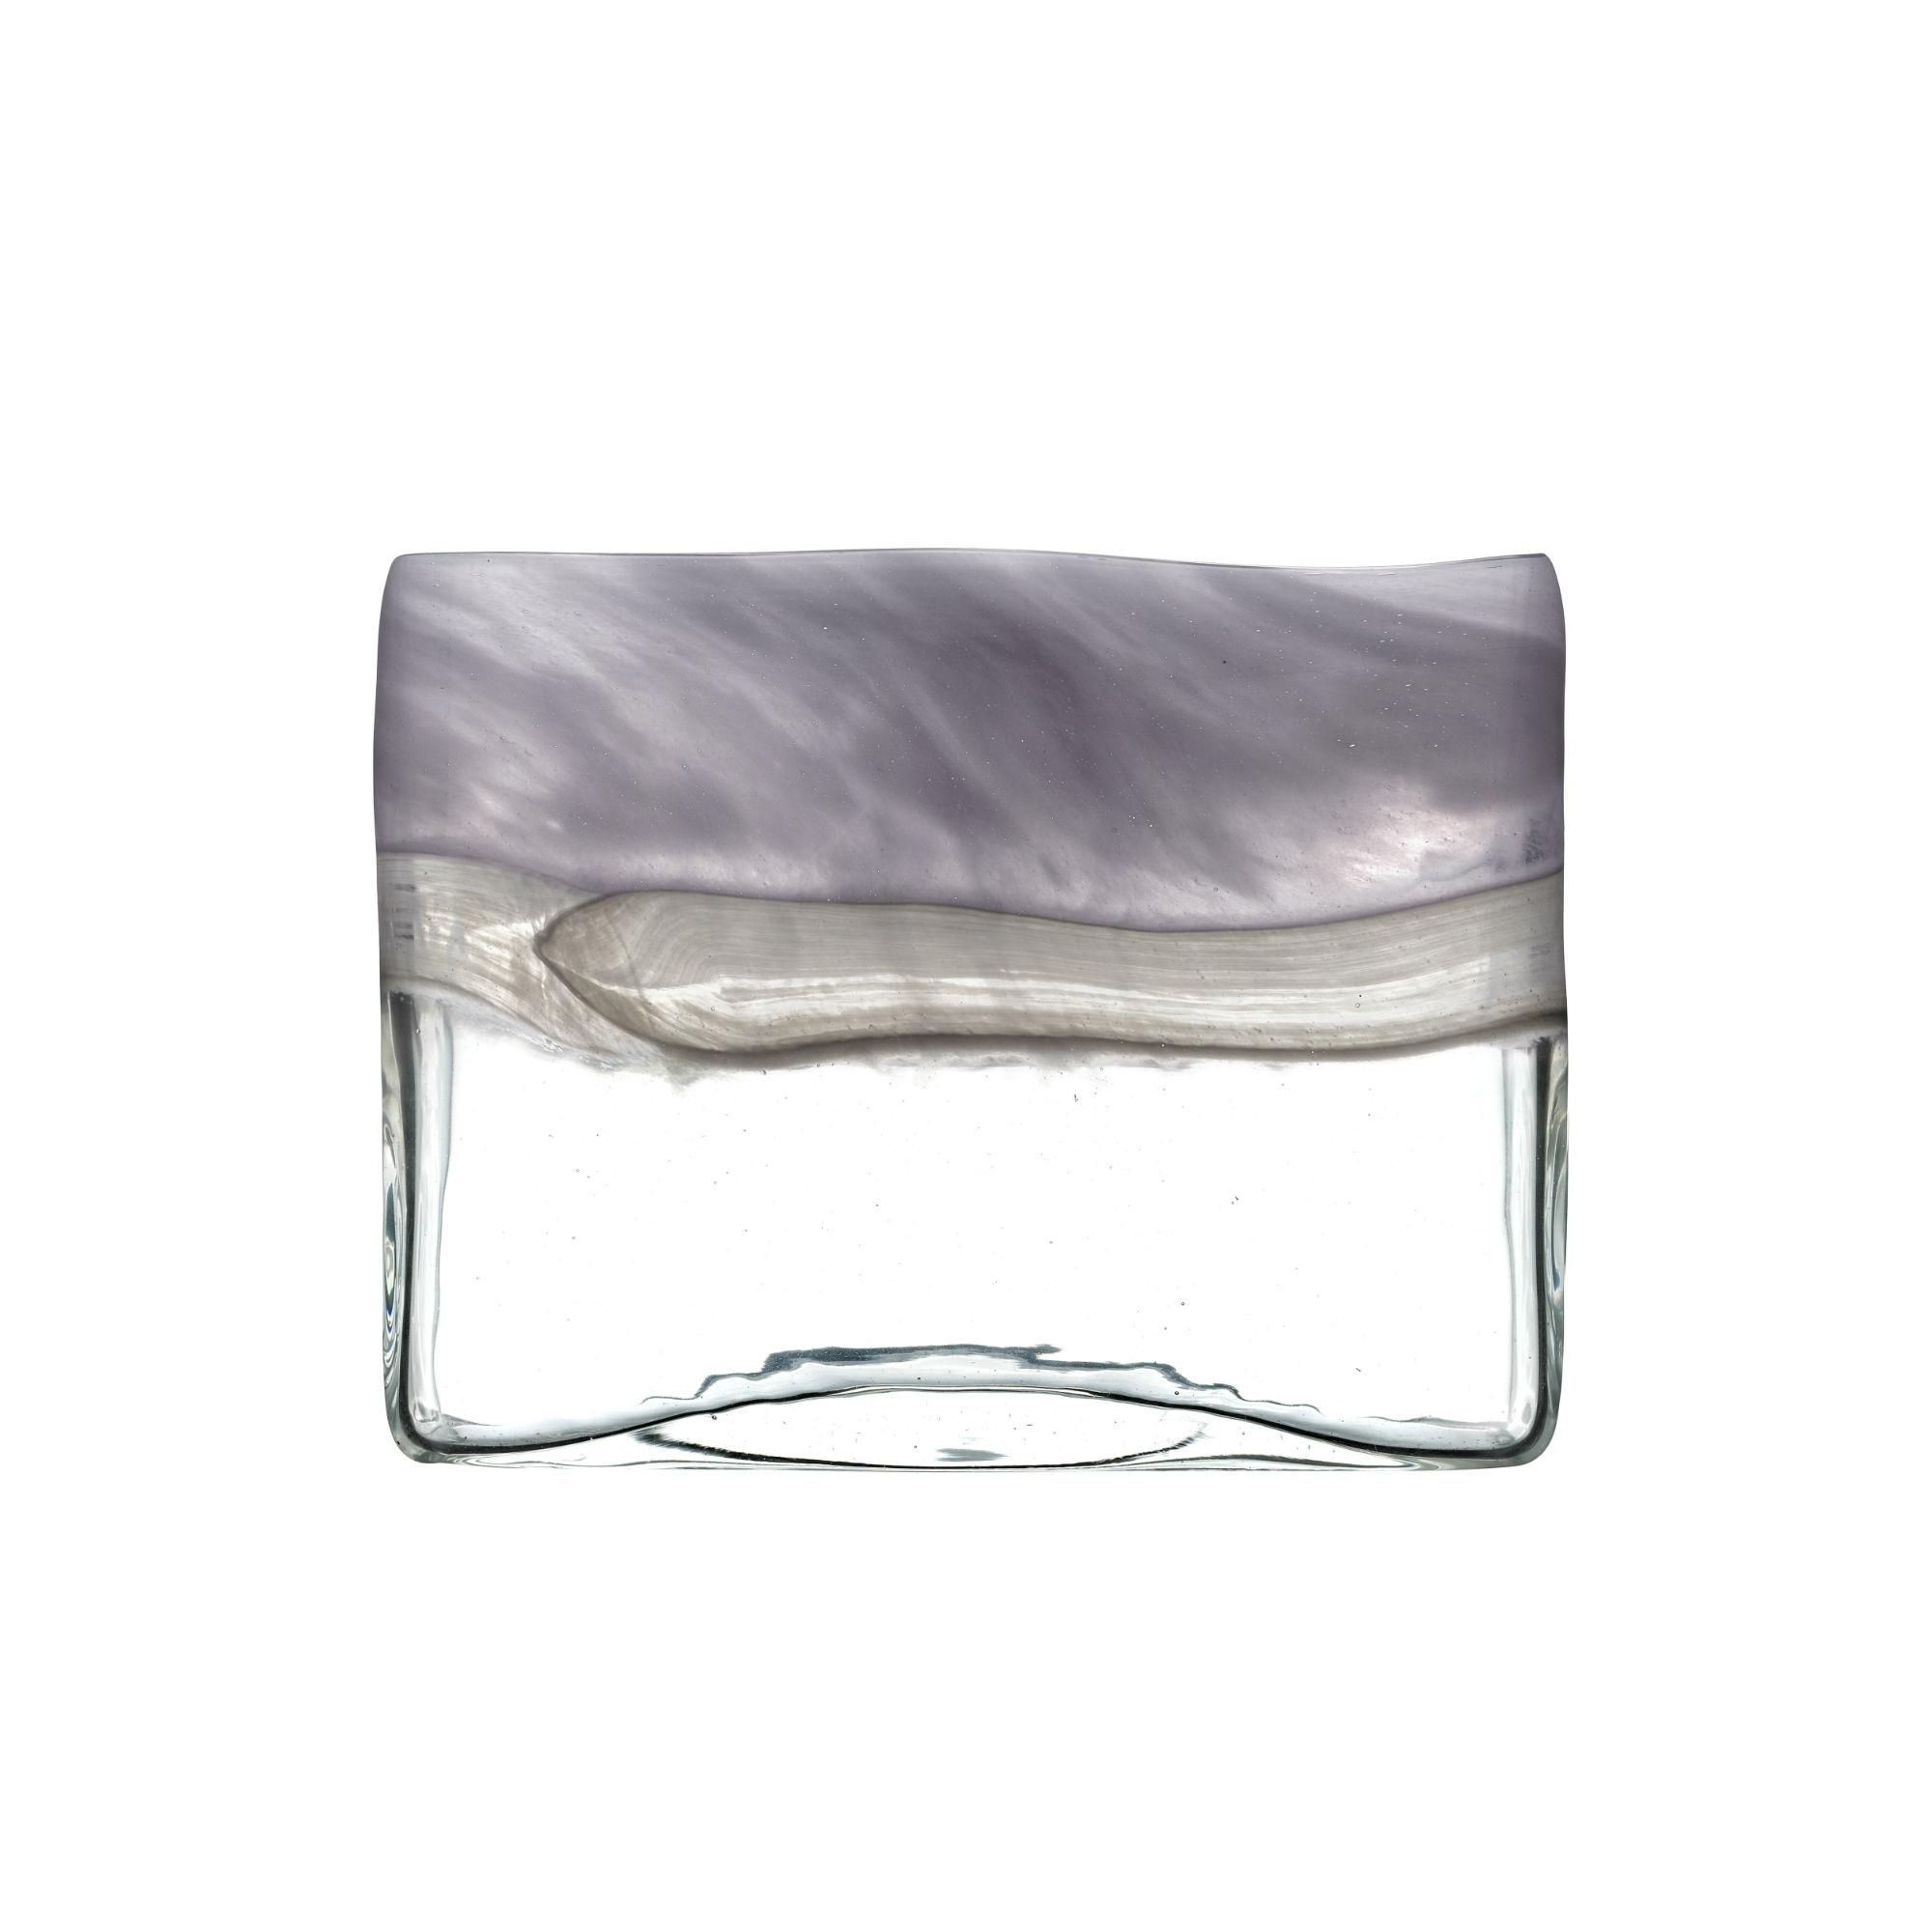 Sabriel Short Vase Moonstone 18cmHx24cmDx10cmW